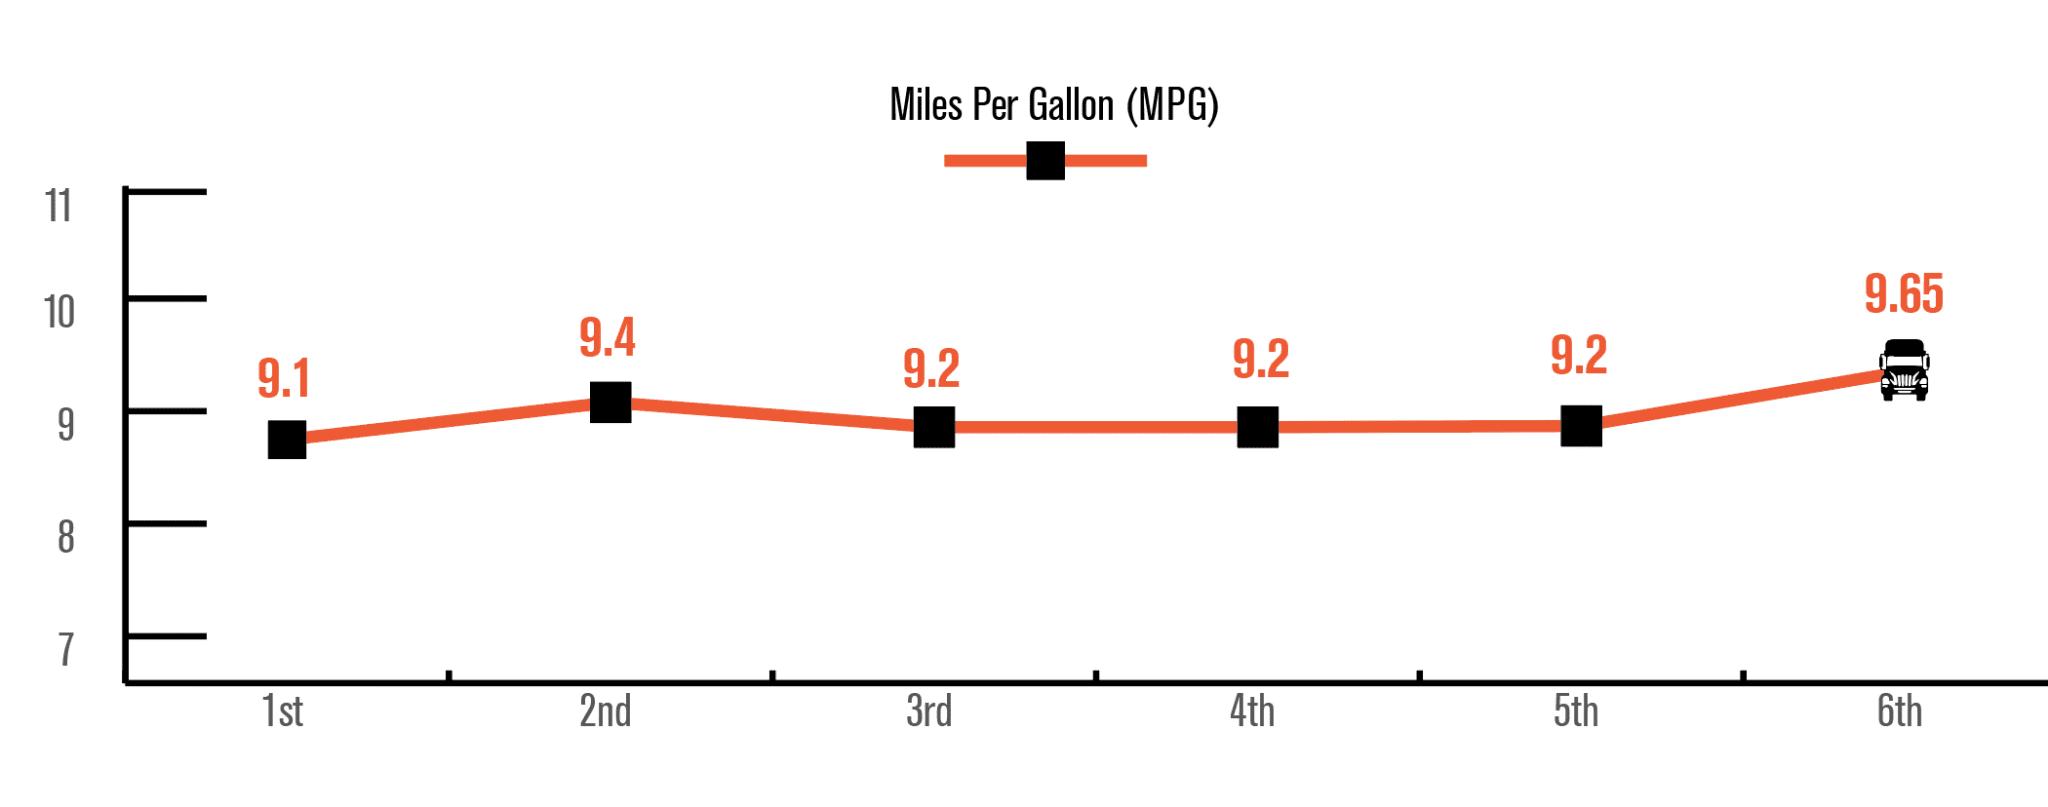 NextGen C10: RACE to 10 MPG: 6th Run MPG Stats: Fuel